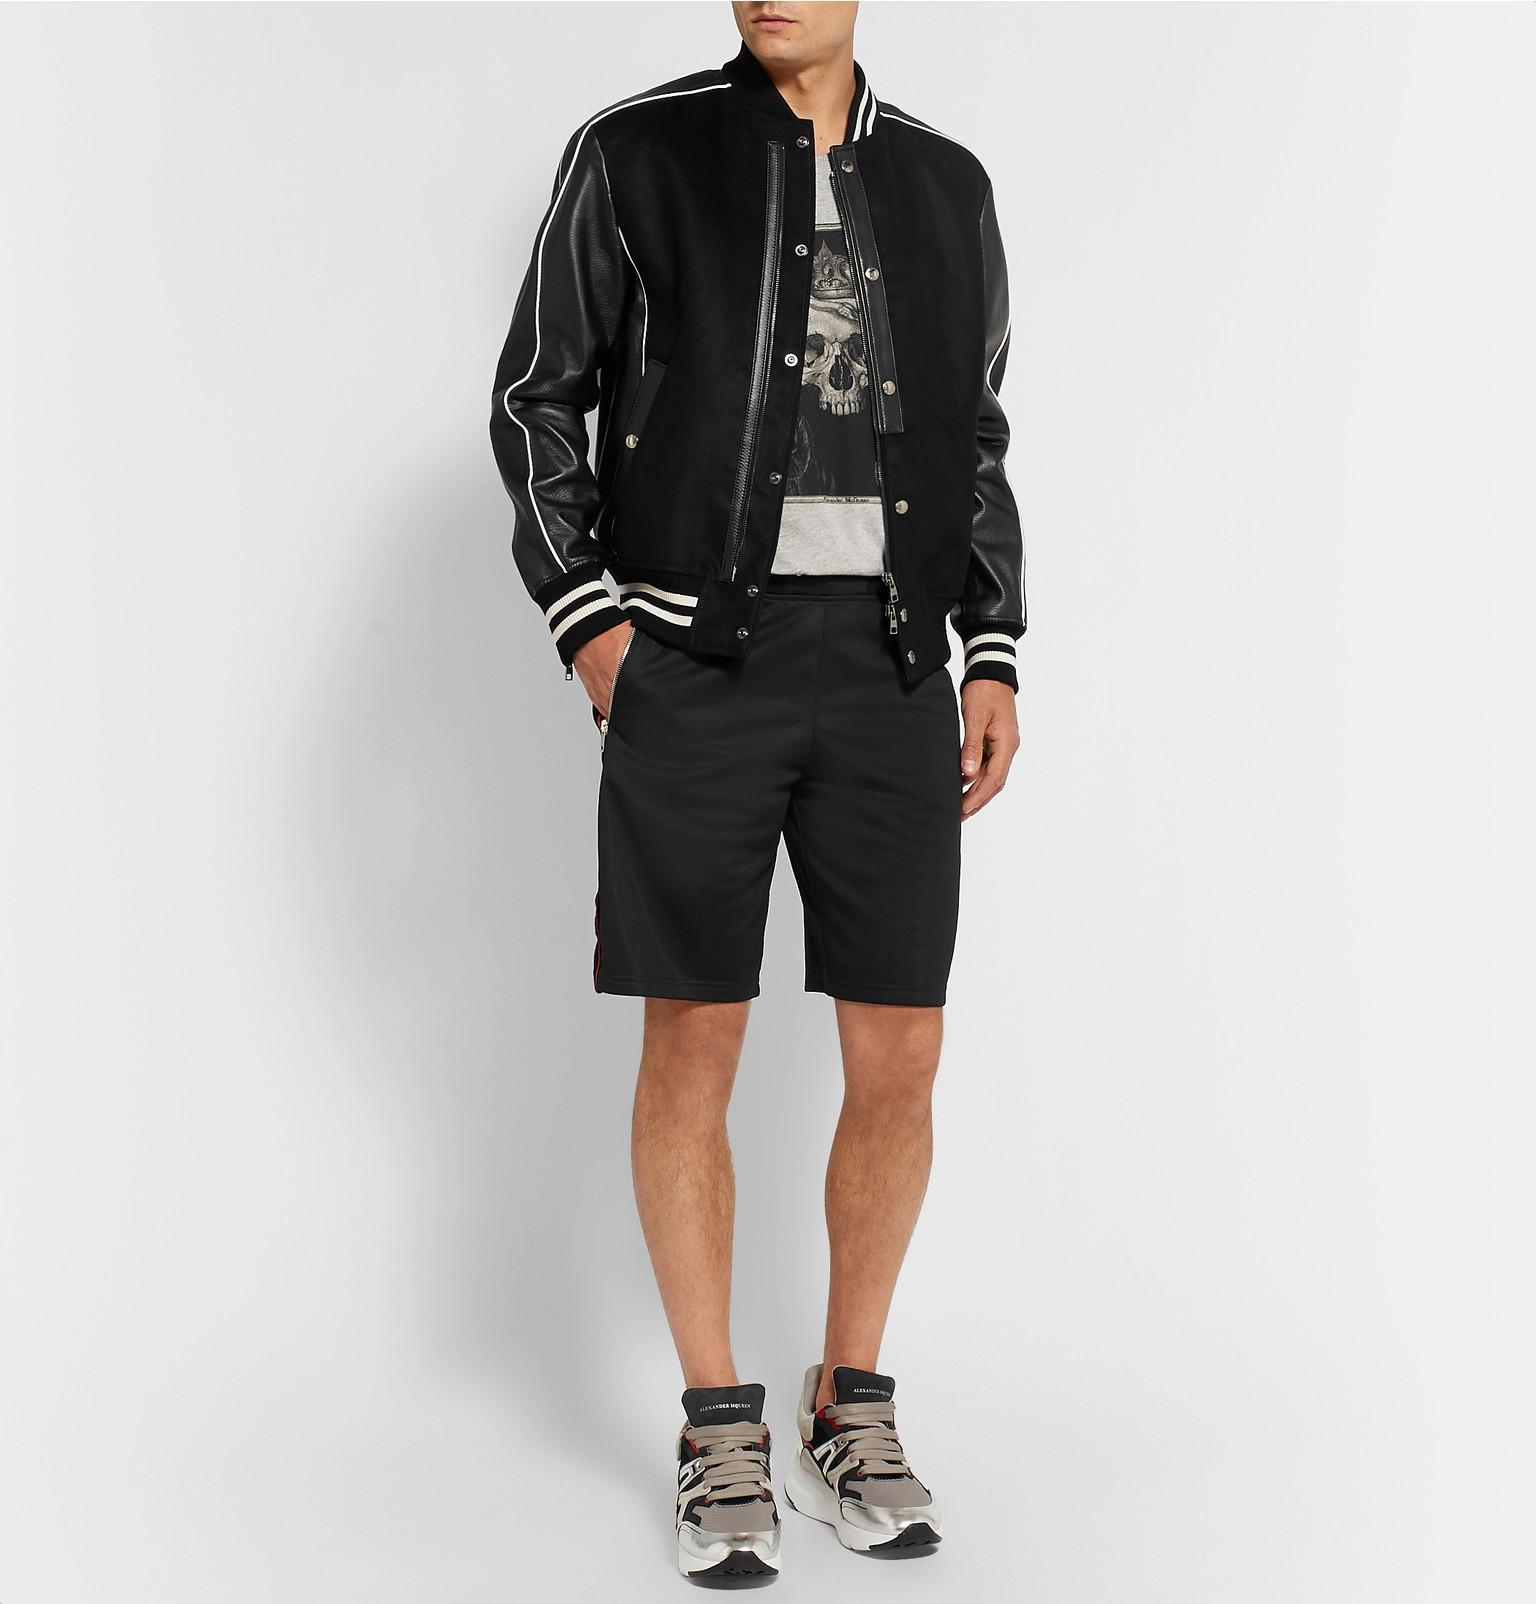 c9b8534bdaa alexander-mcqueen-black-Full-grain-Leather-trimmed-Moleskin-Bomber-Jacket.jpeg